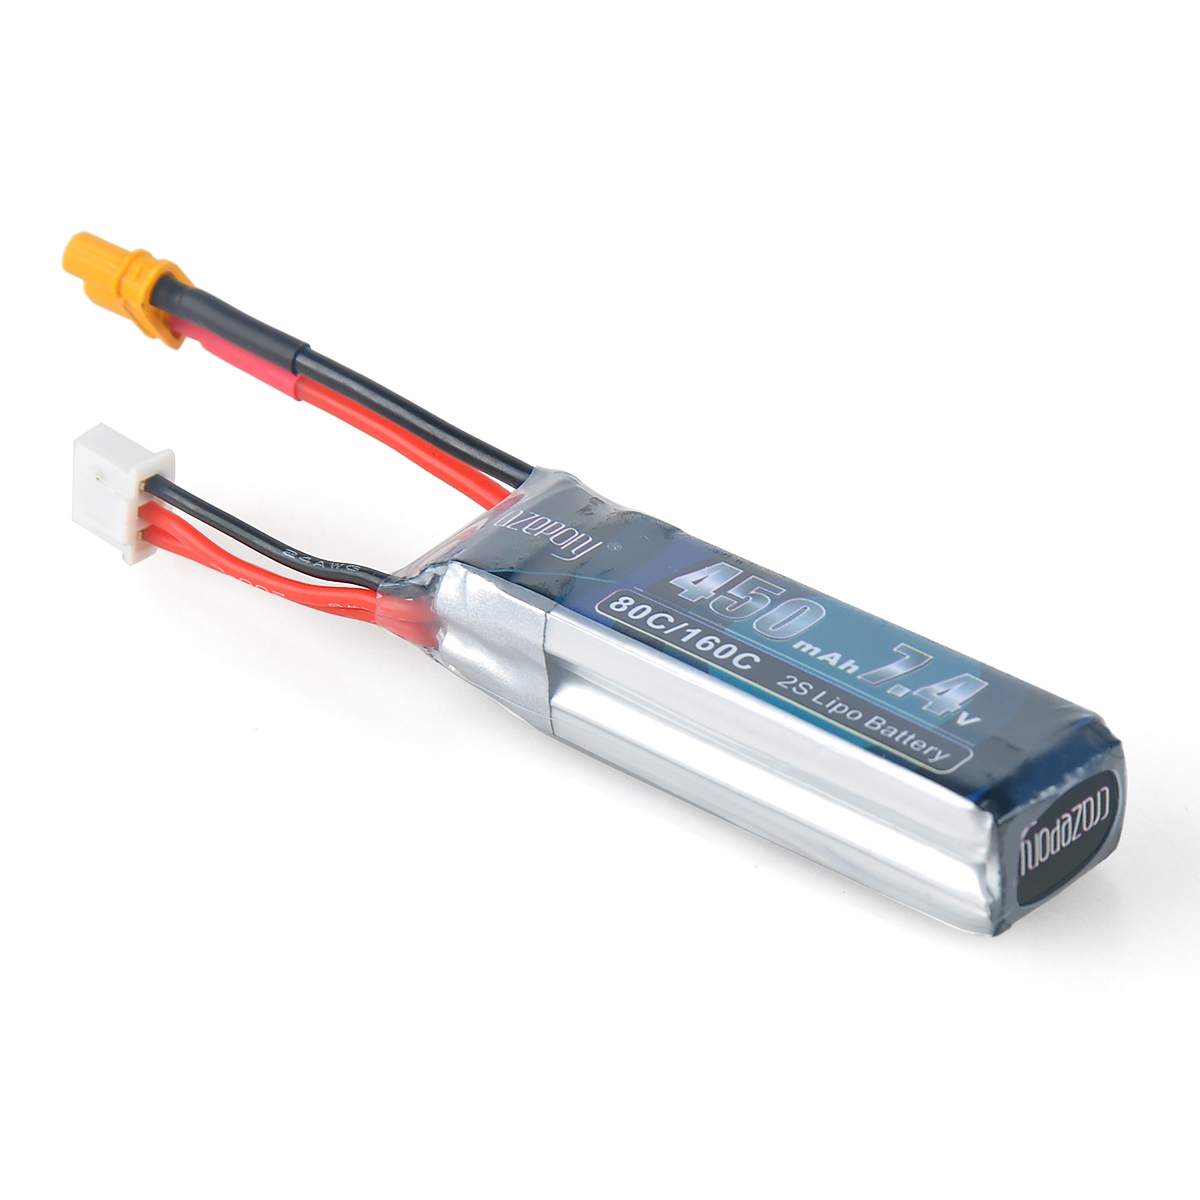 2x 450mAh 2S 7.4V LiPo Battery Packs XT30 Plug for Micro FPV Racing RC Drone Toy